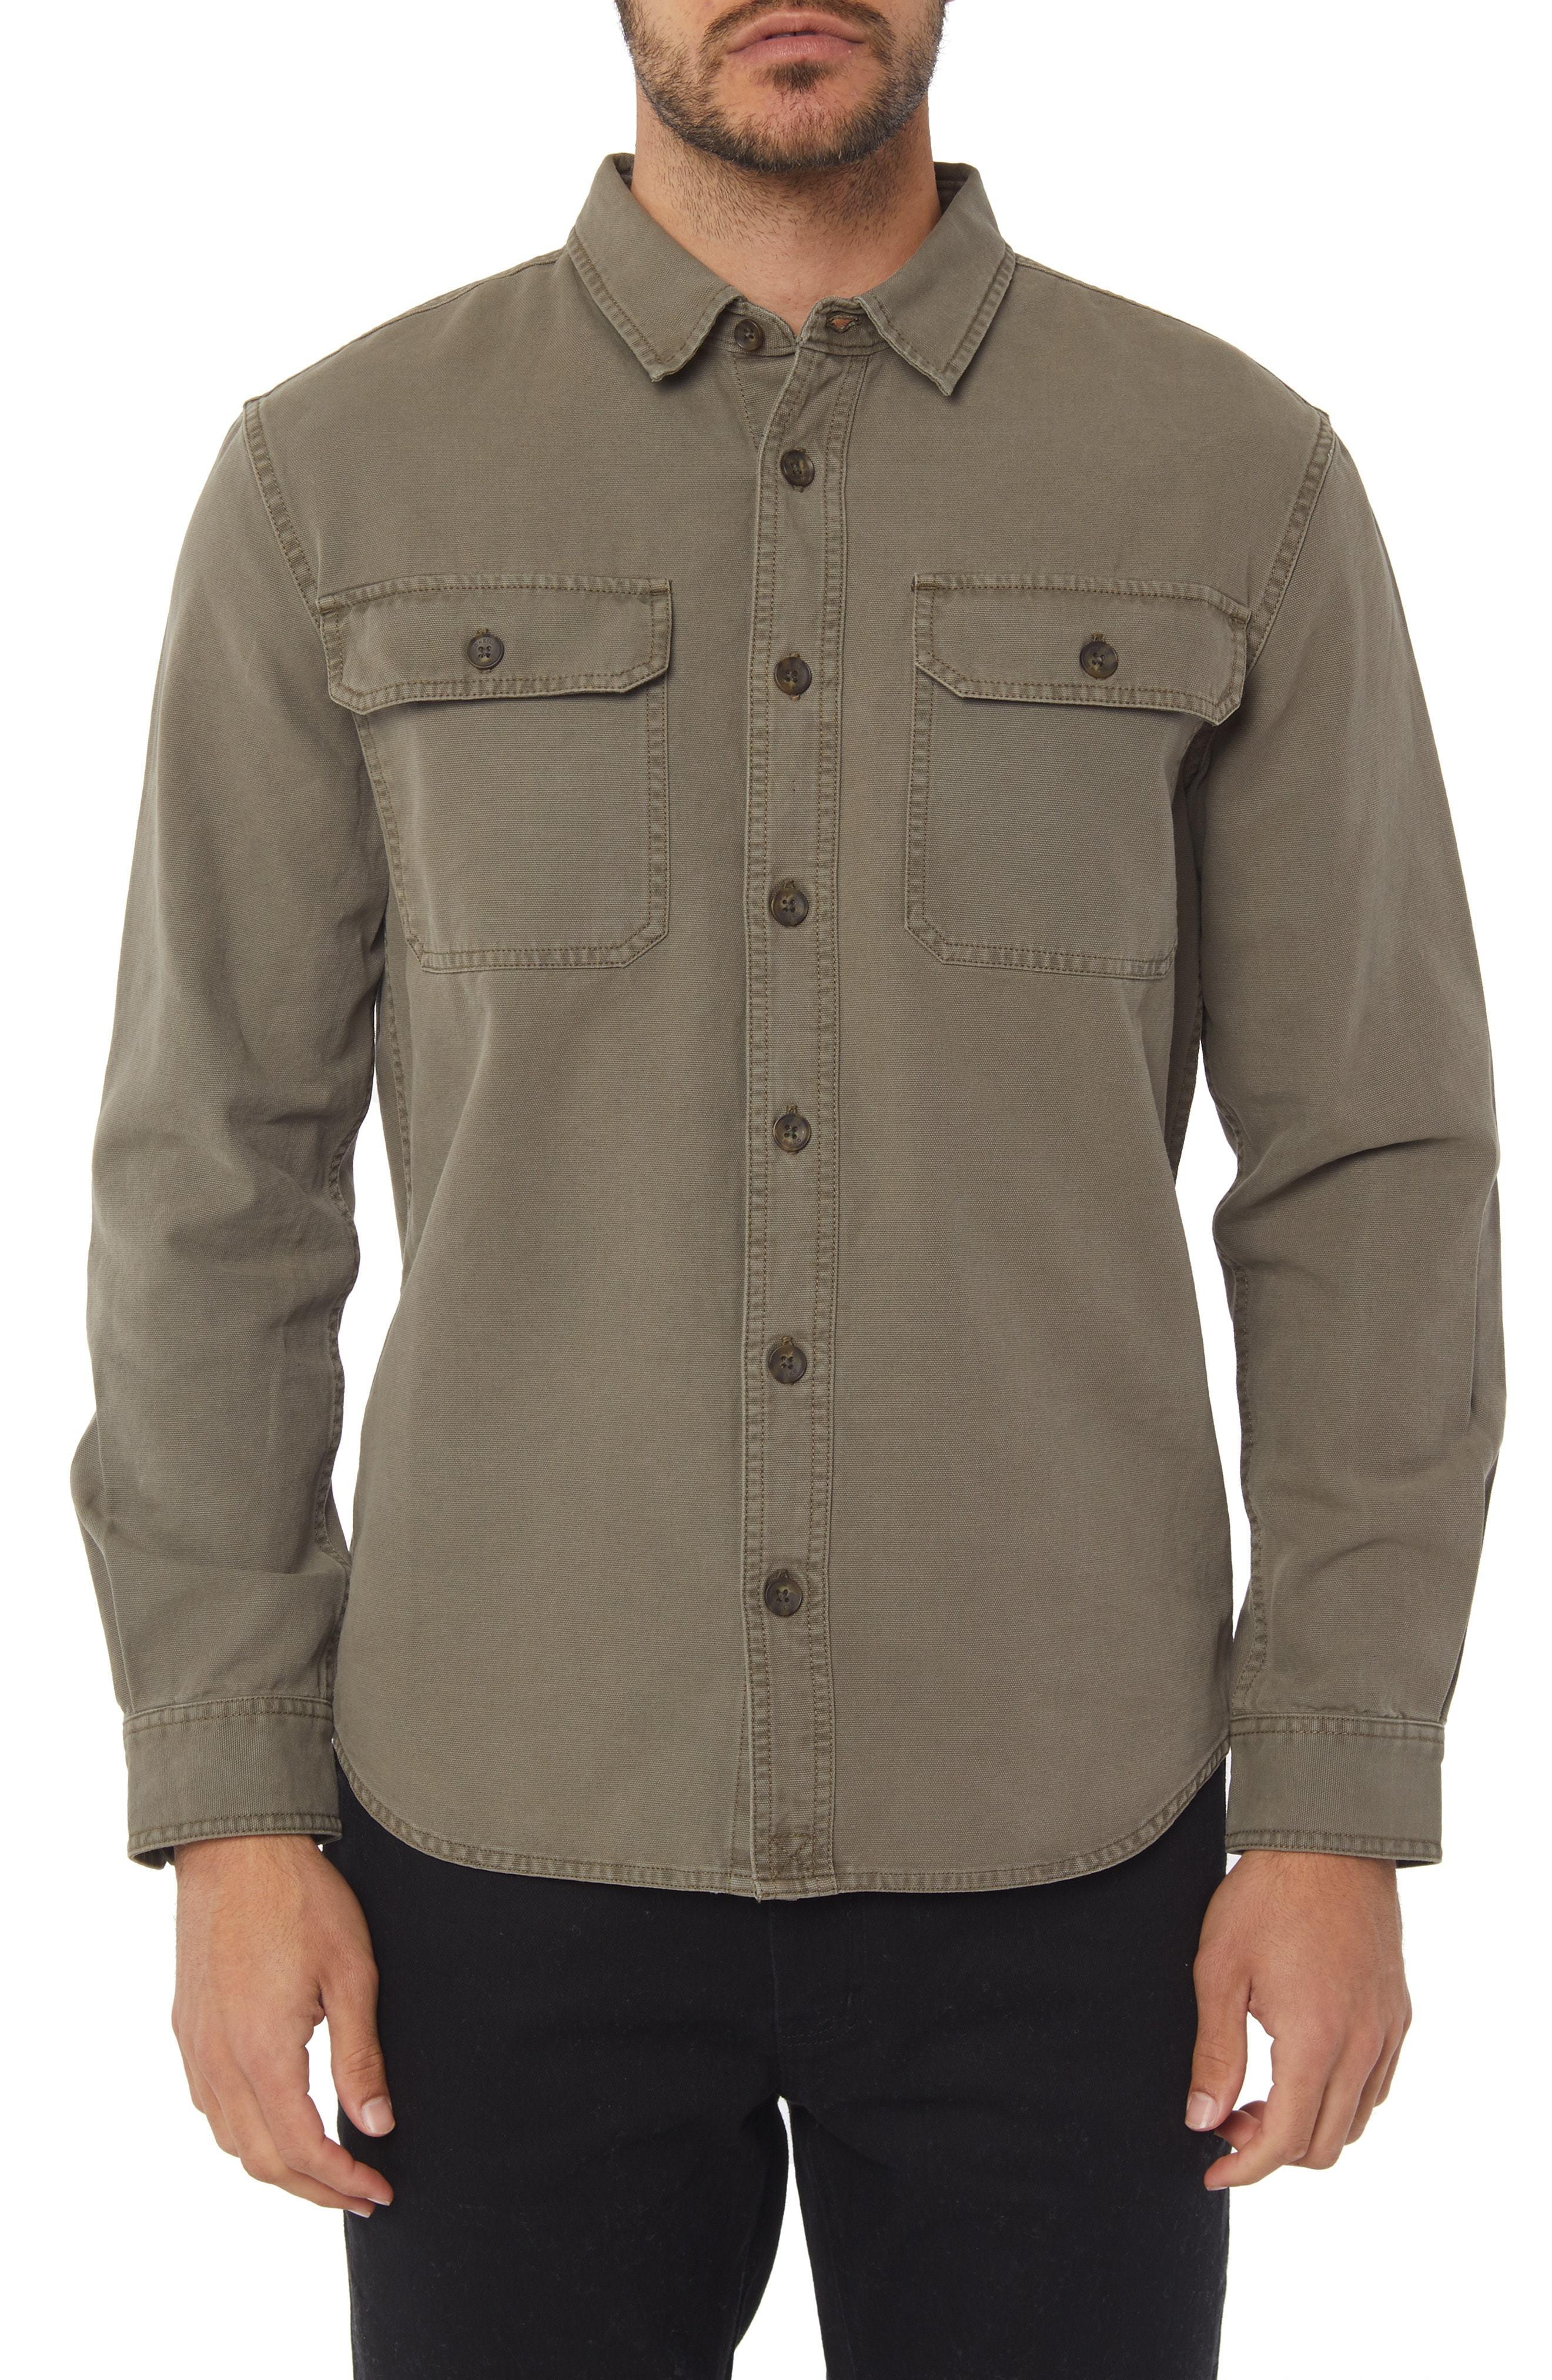 aae43199c2c Seasons Long Sleeve Sport Shirt